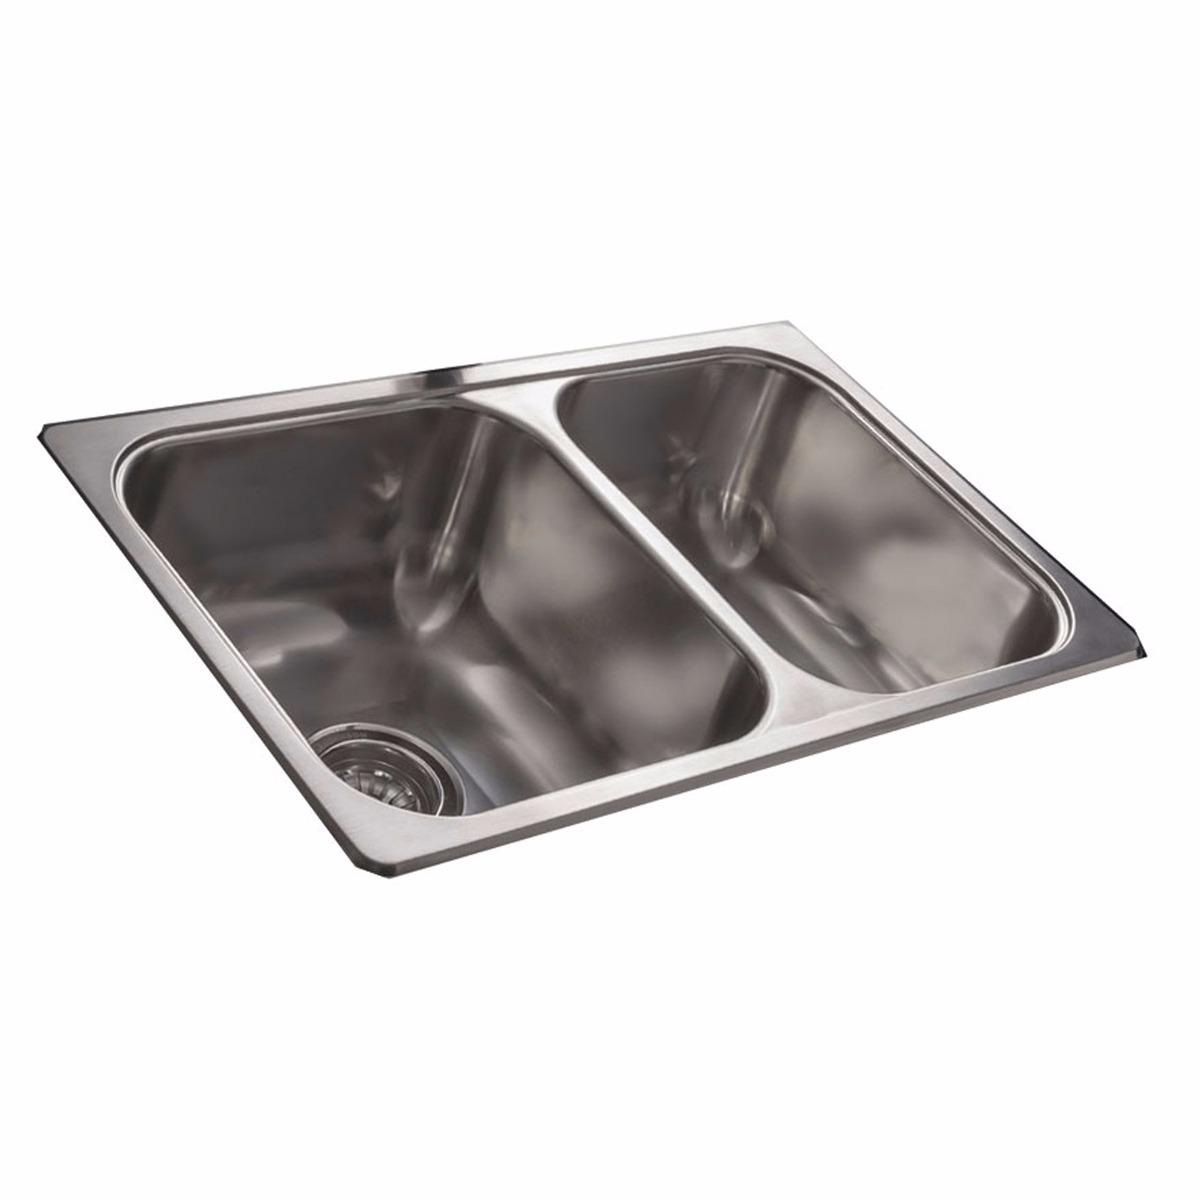 bacha doble johnson r63 18 f cocina mesada acero inoxidable. Cargando zoom. 768930935515